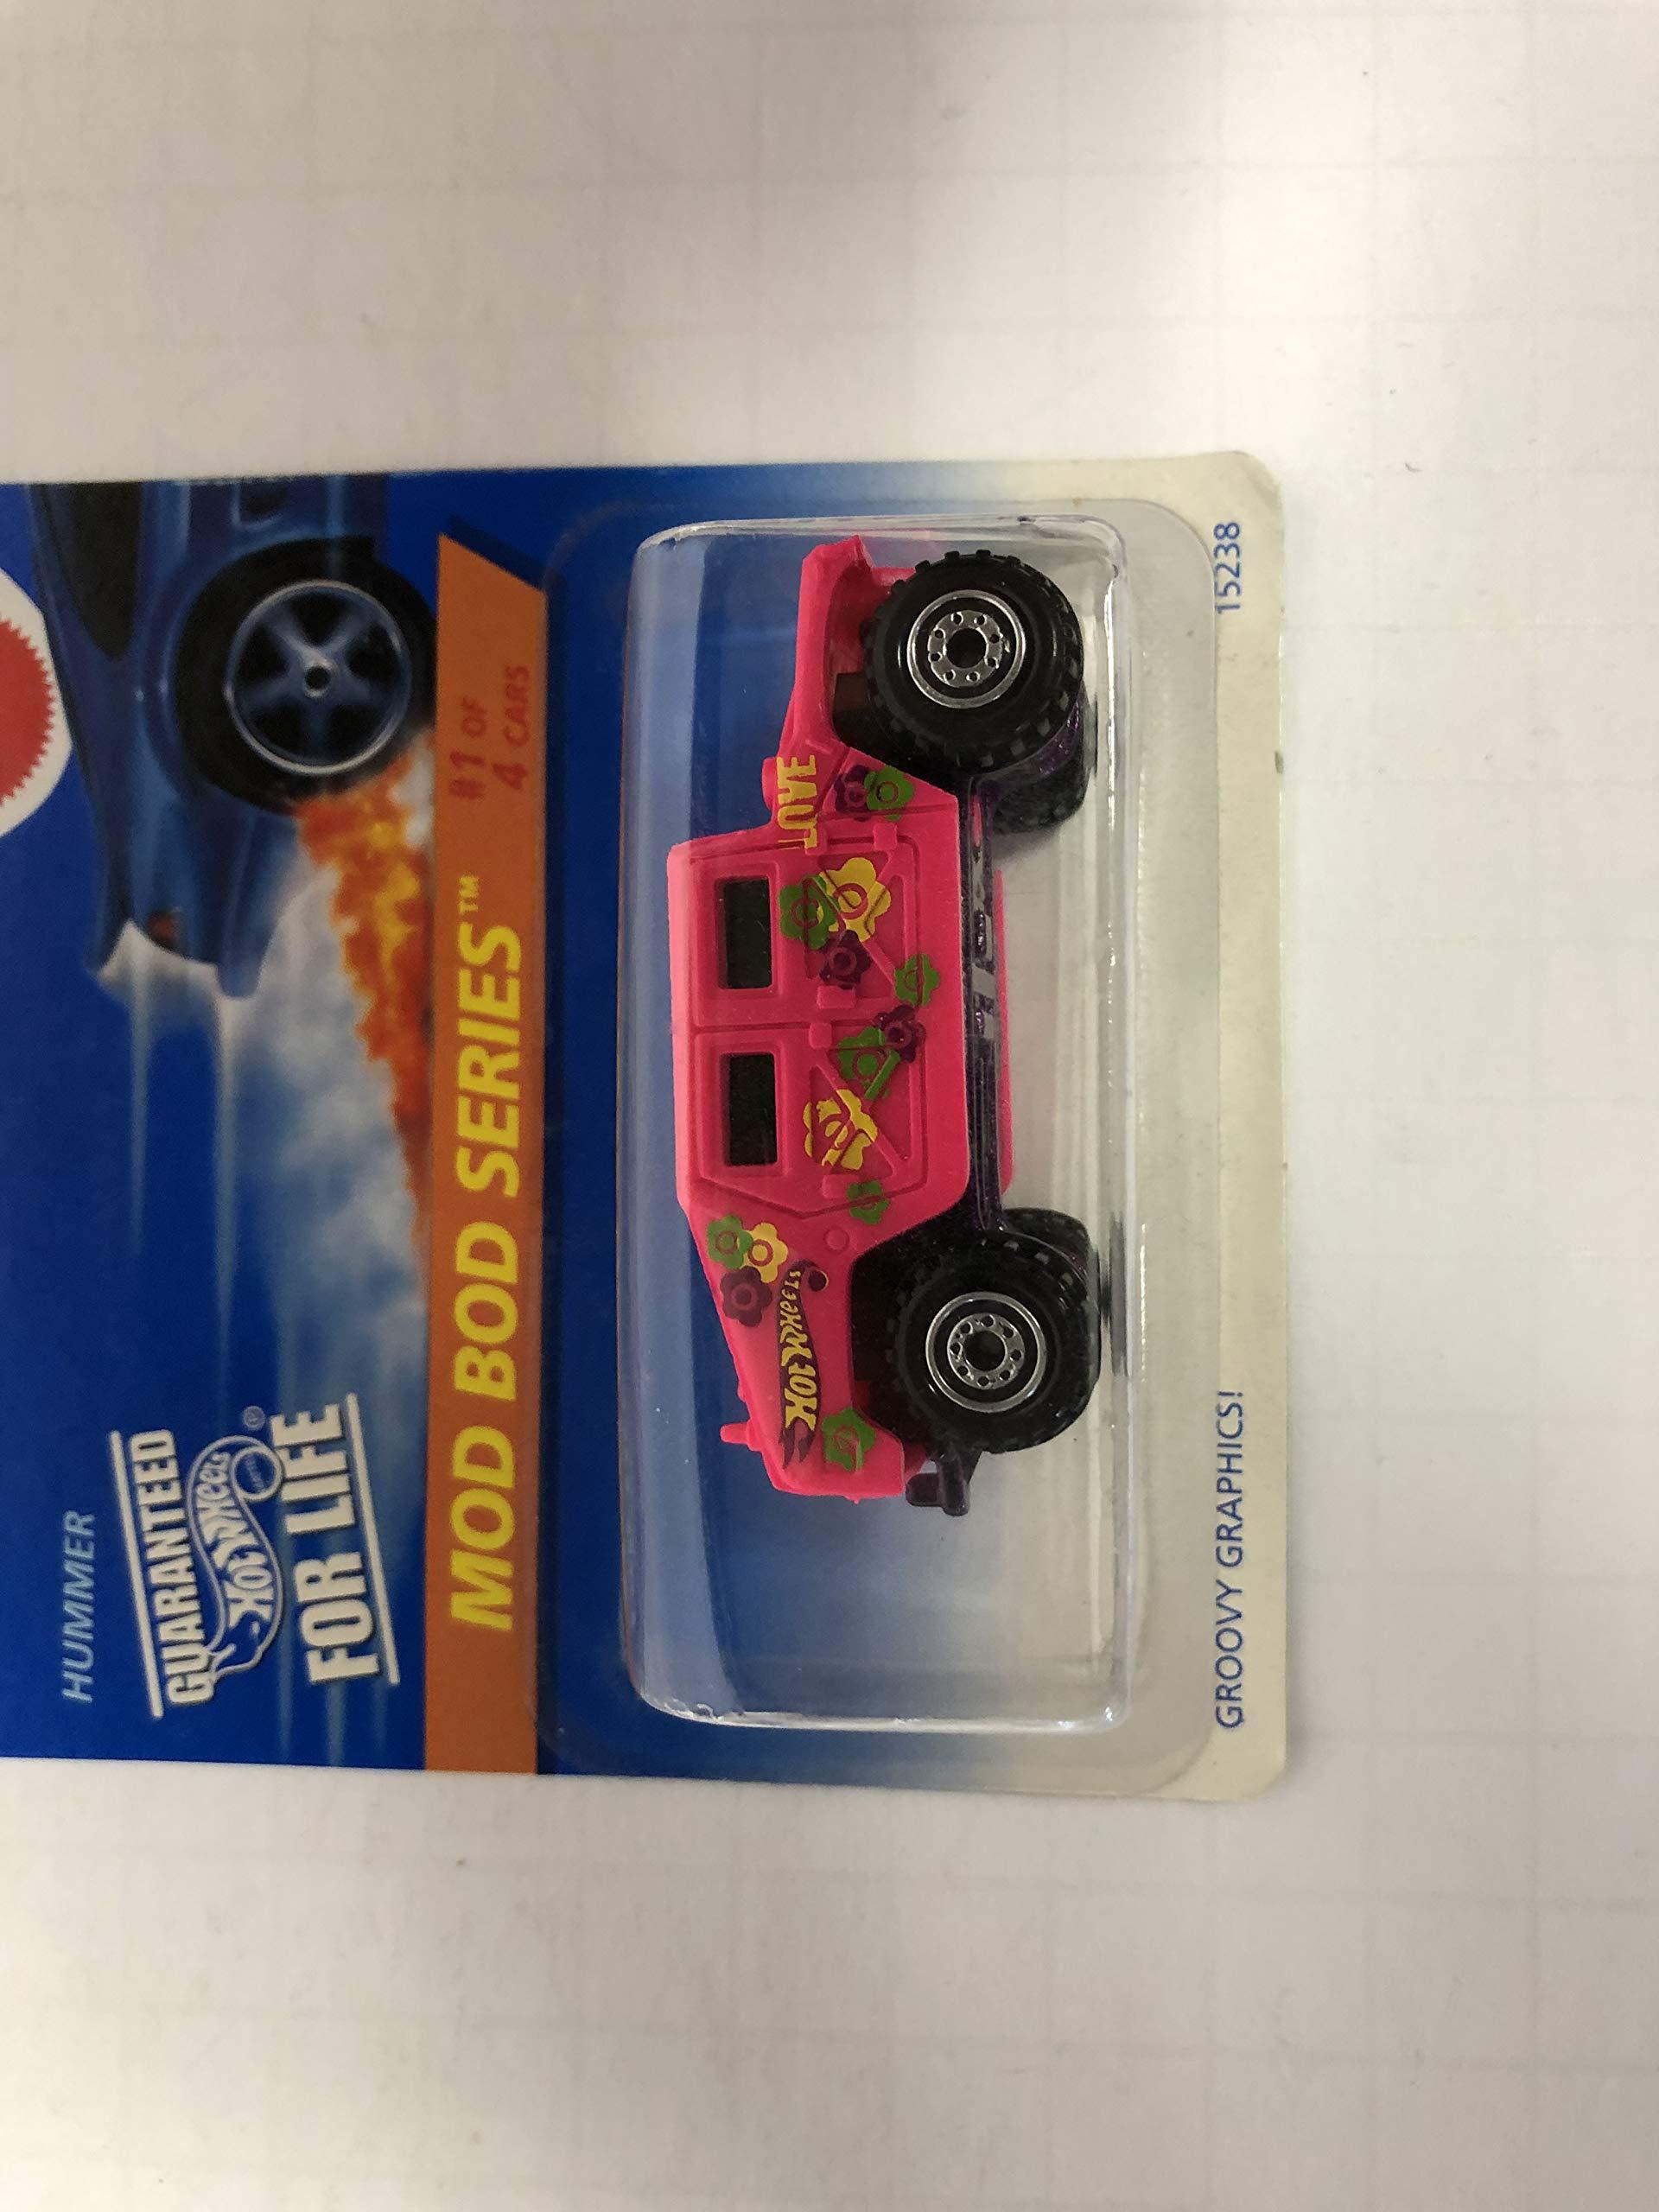 HUMMER (Pink Paint) Mod Bod Series 1996 Hot Wheels No. 15238 diecast 1/64 scale car